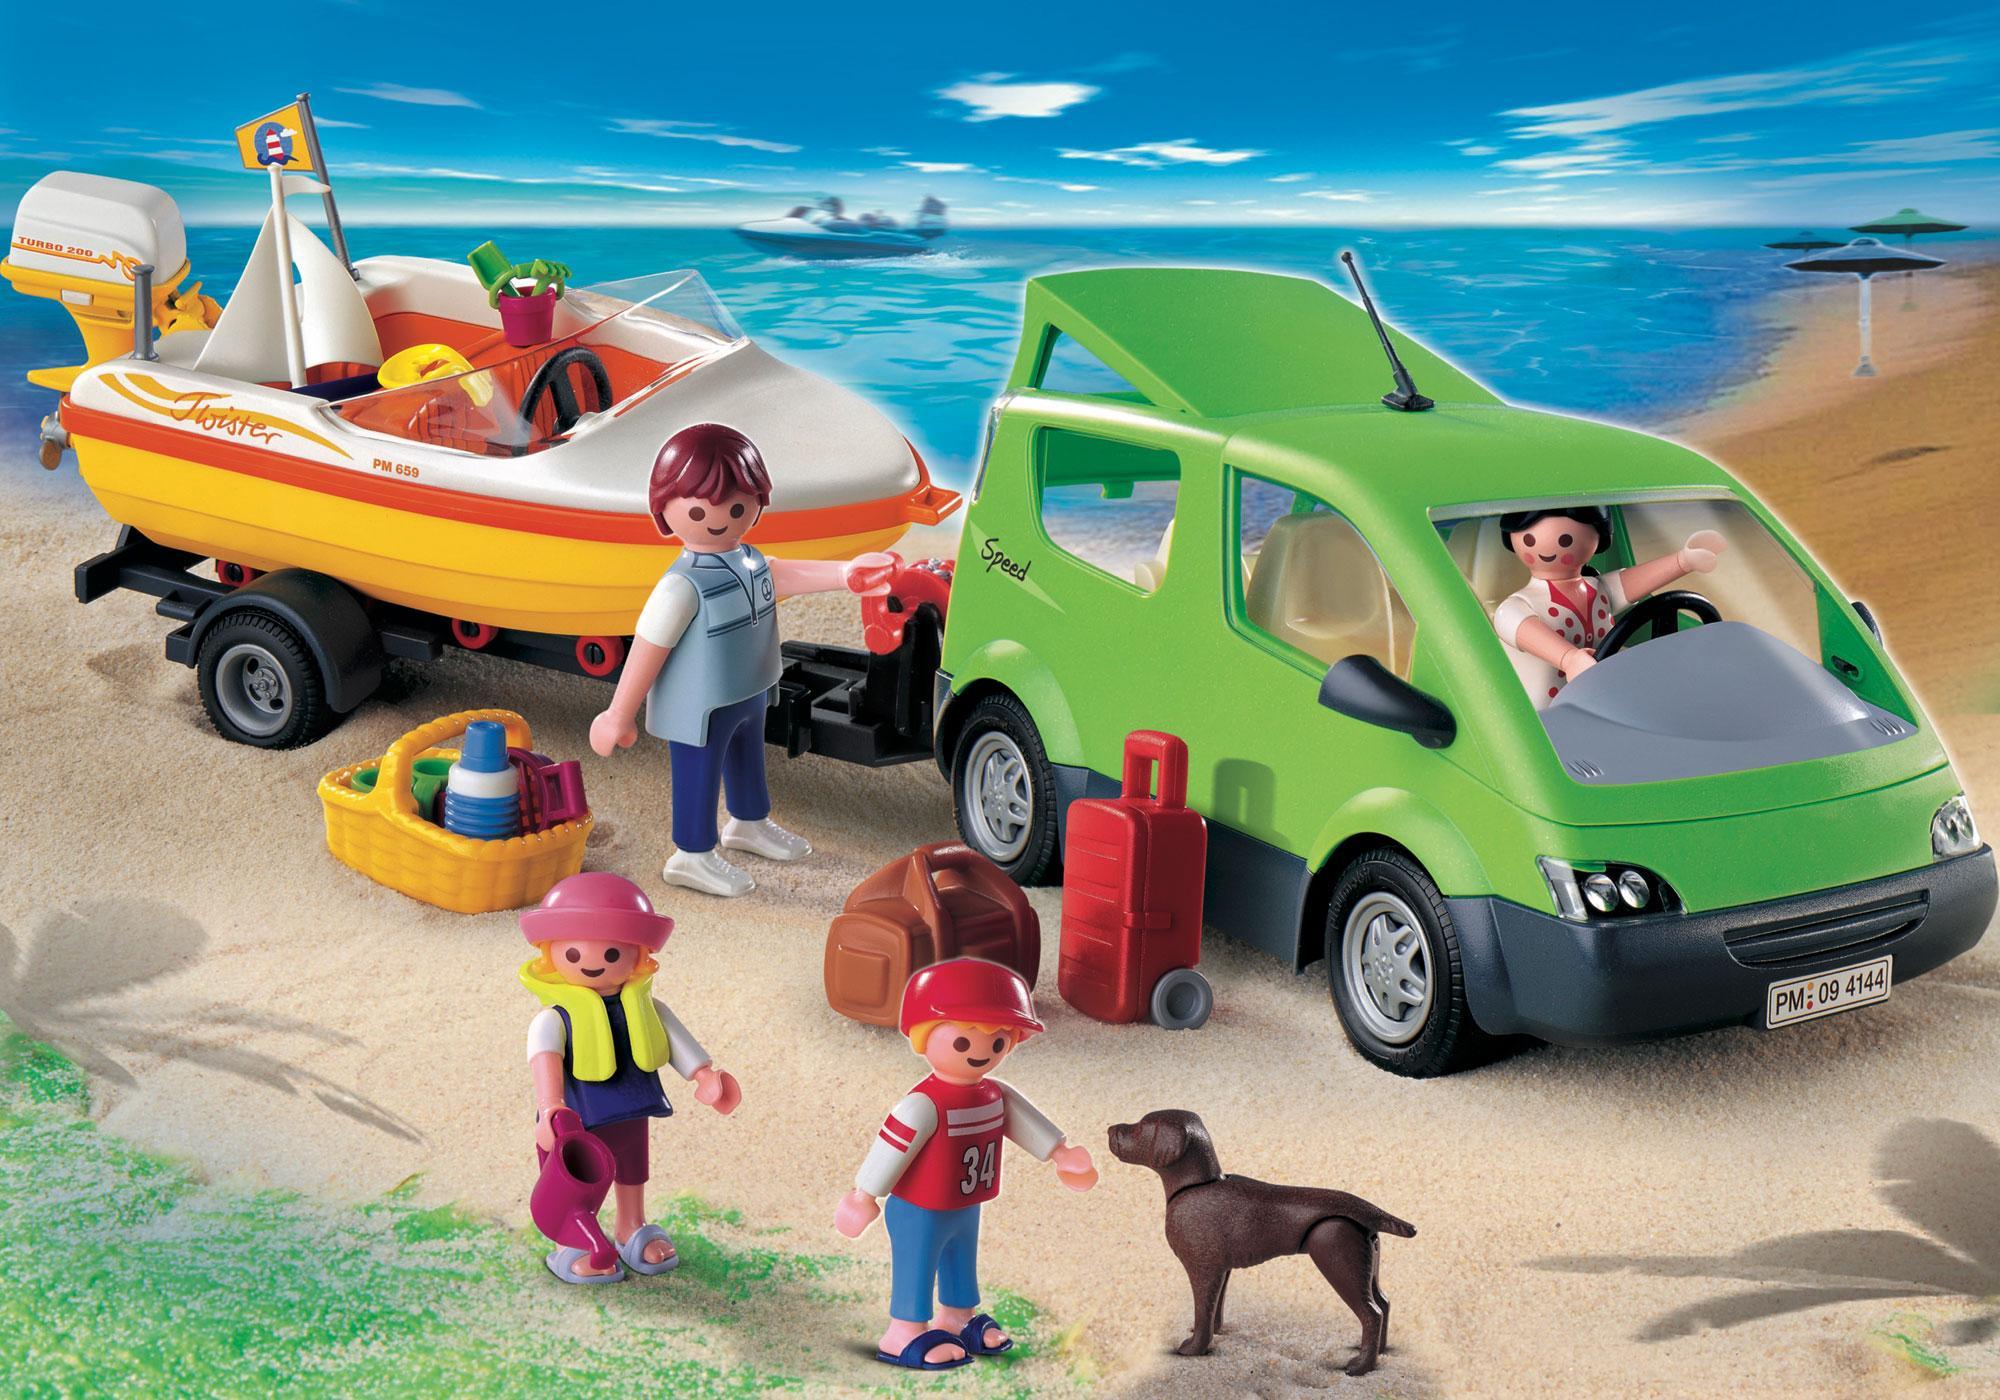 http://media.playmobil.com/i/playmobil/4144_product_detail/Familyvan mit Bootsanhänger